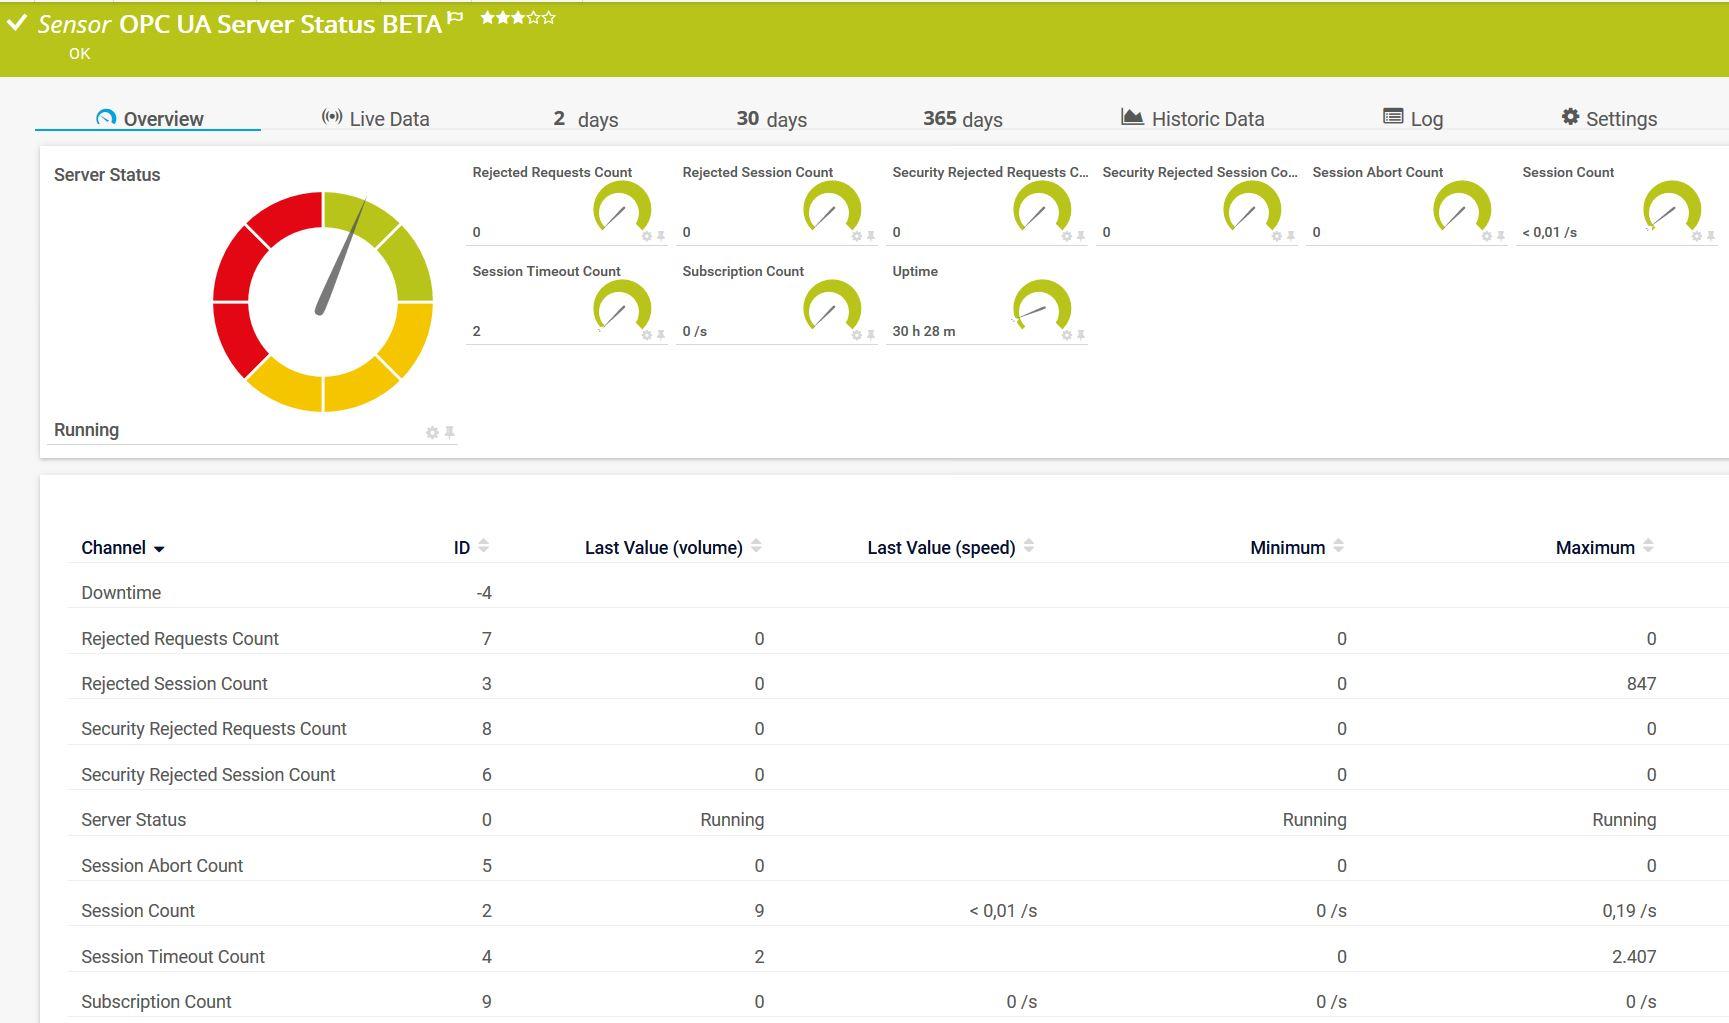 opc-ua-server-status-beta.jpg